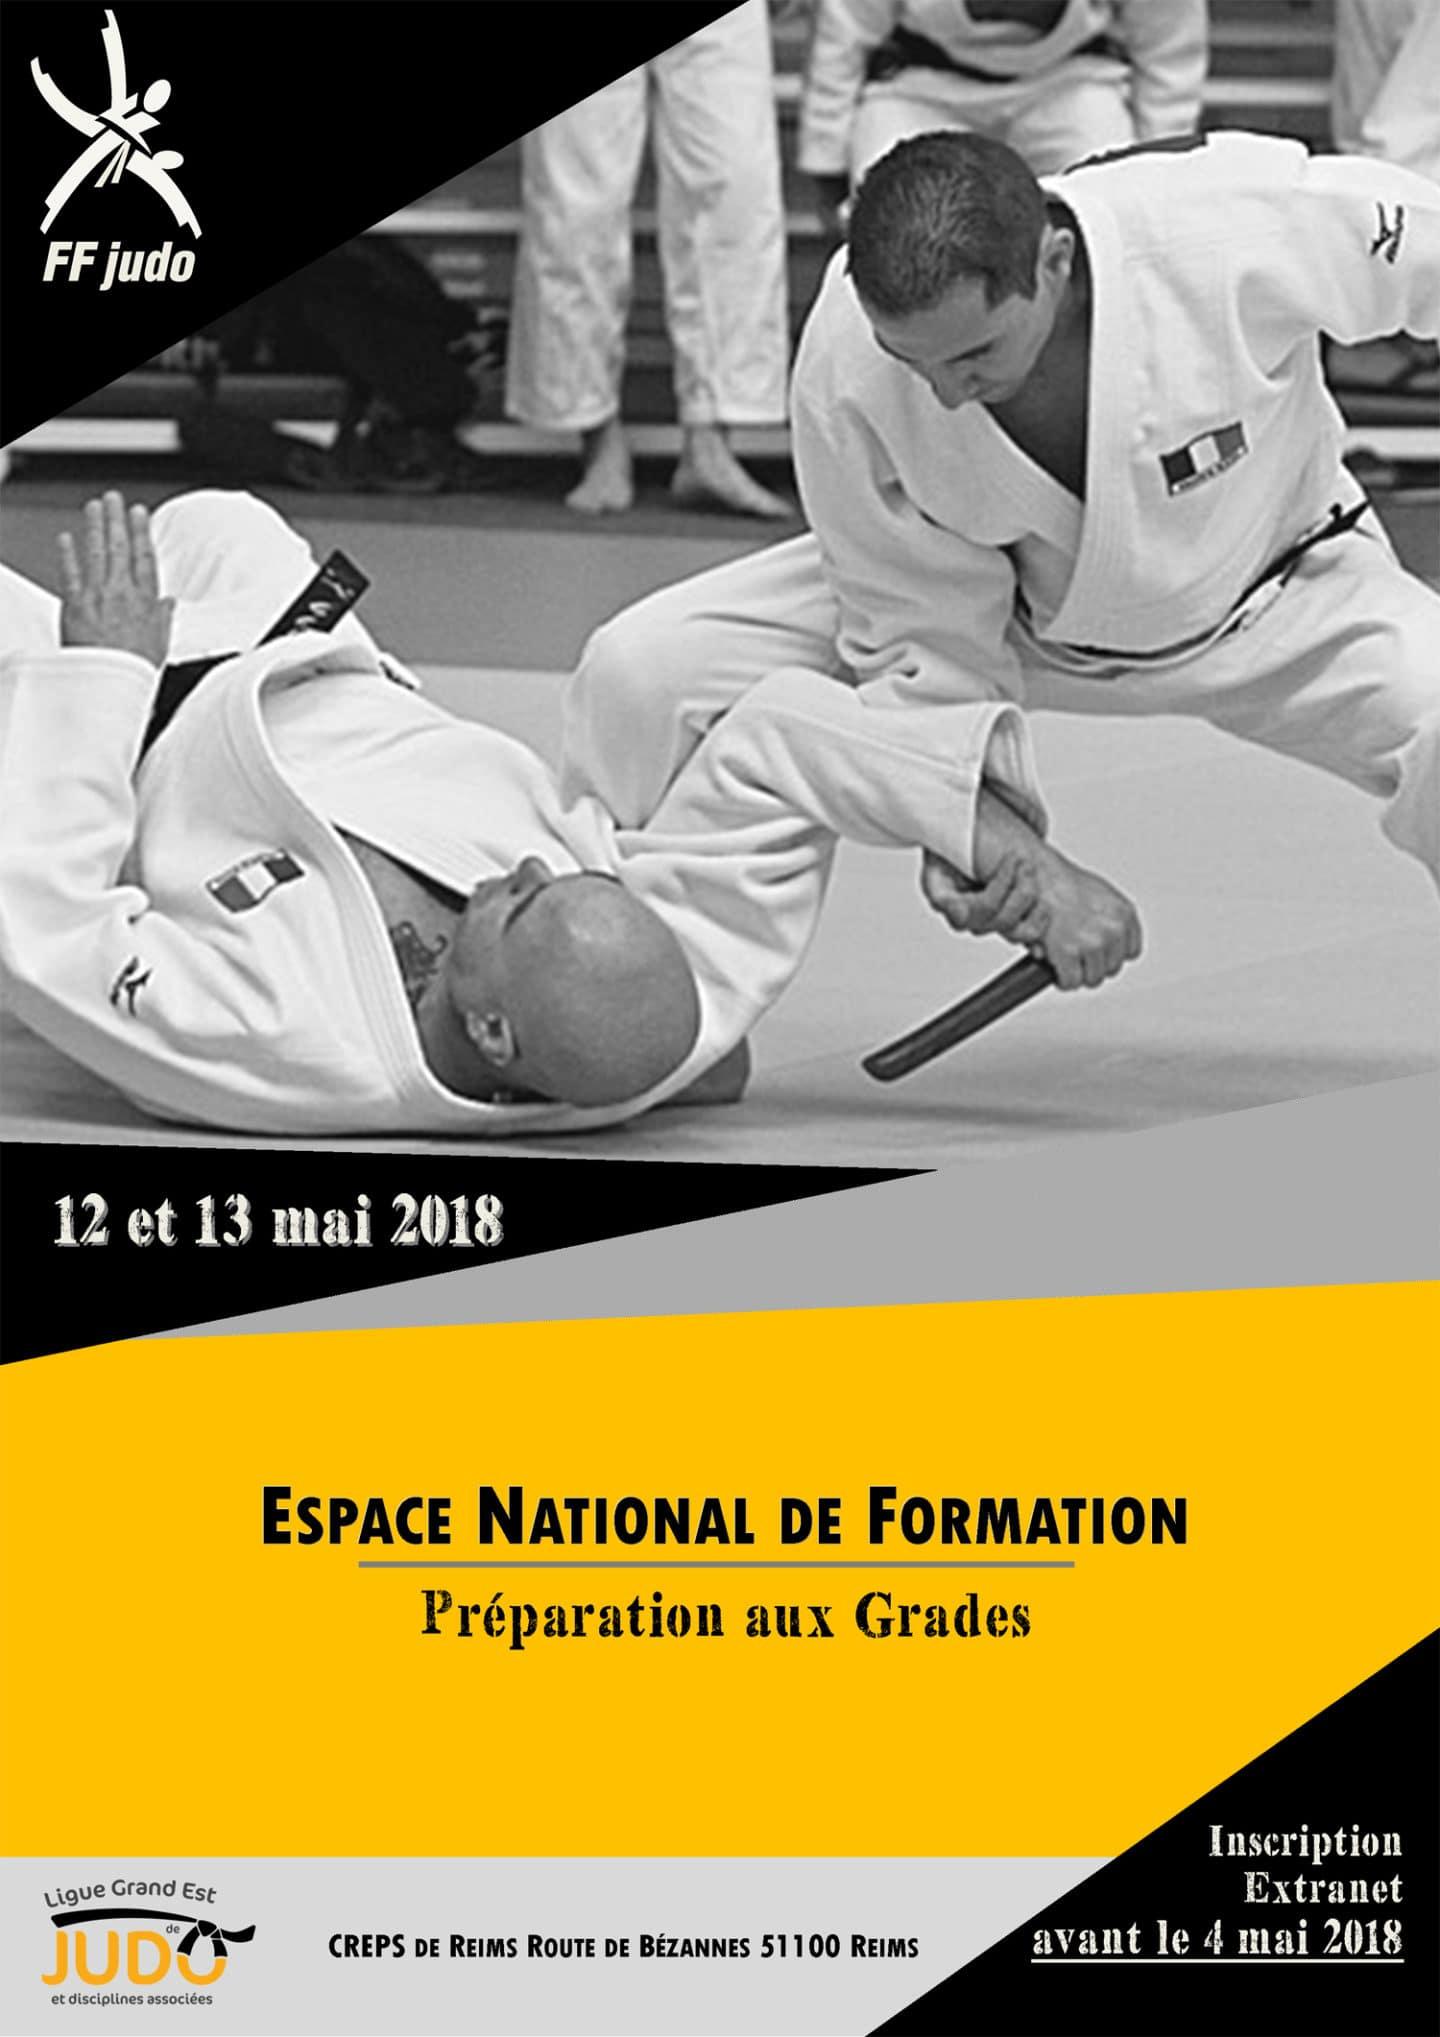 enf_stage-preparation_grades